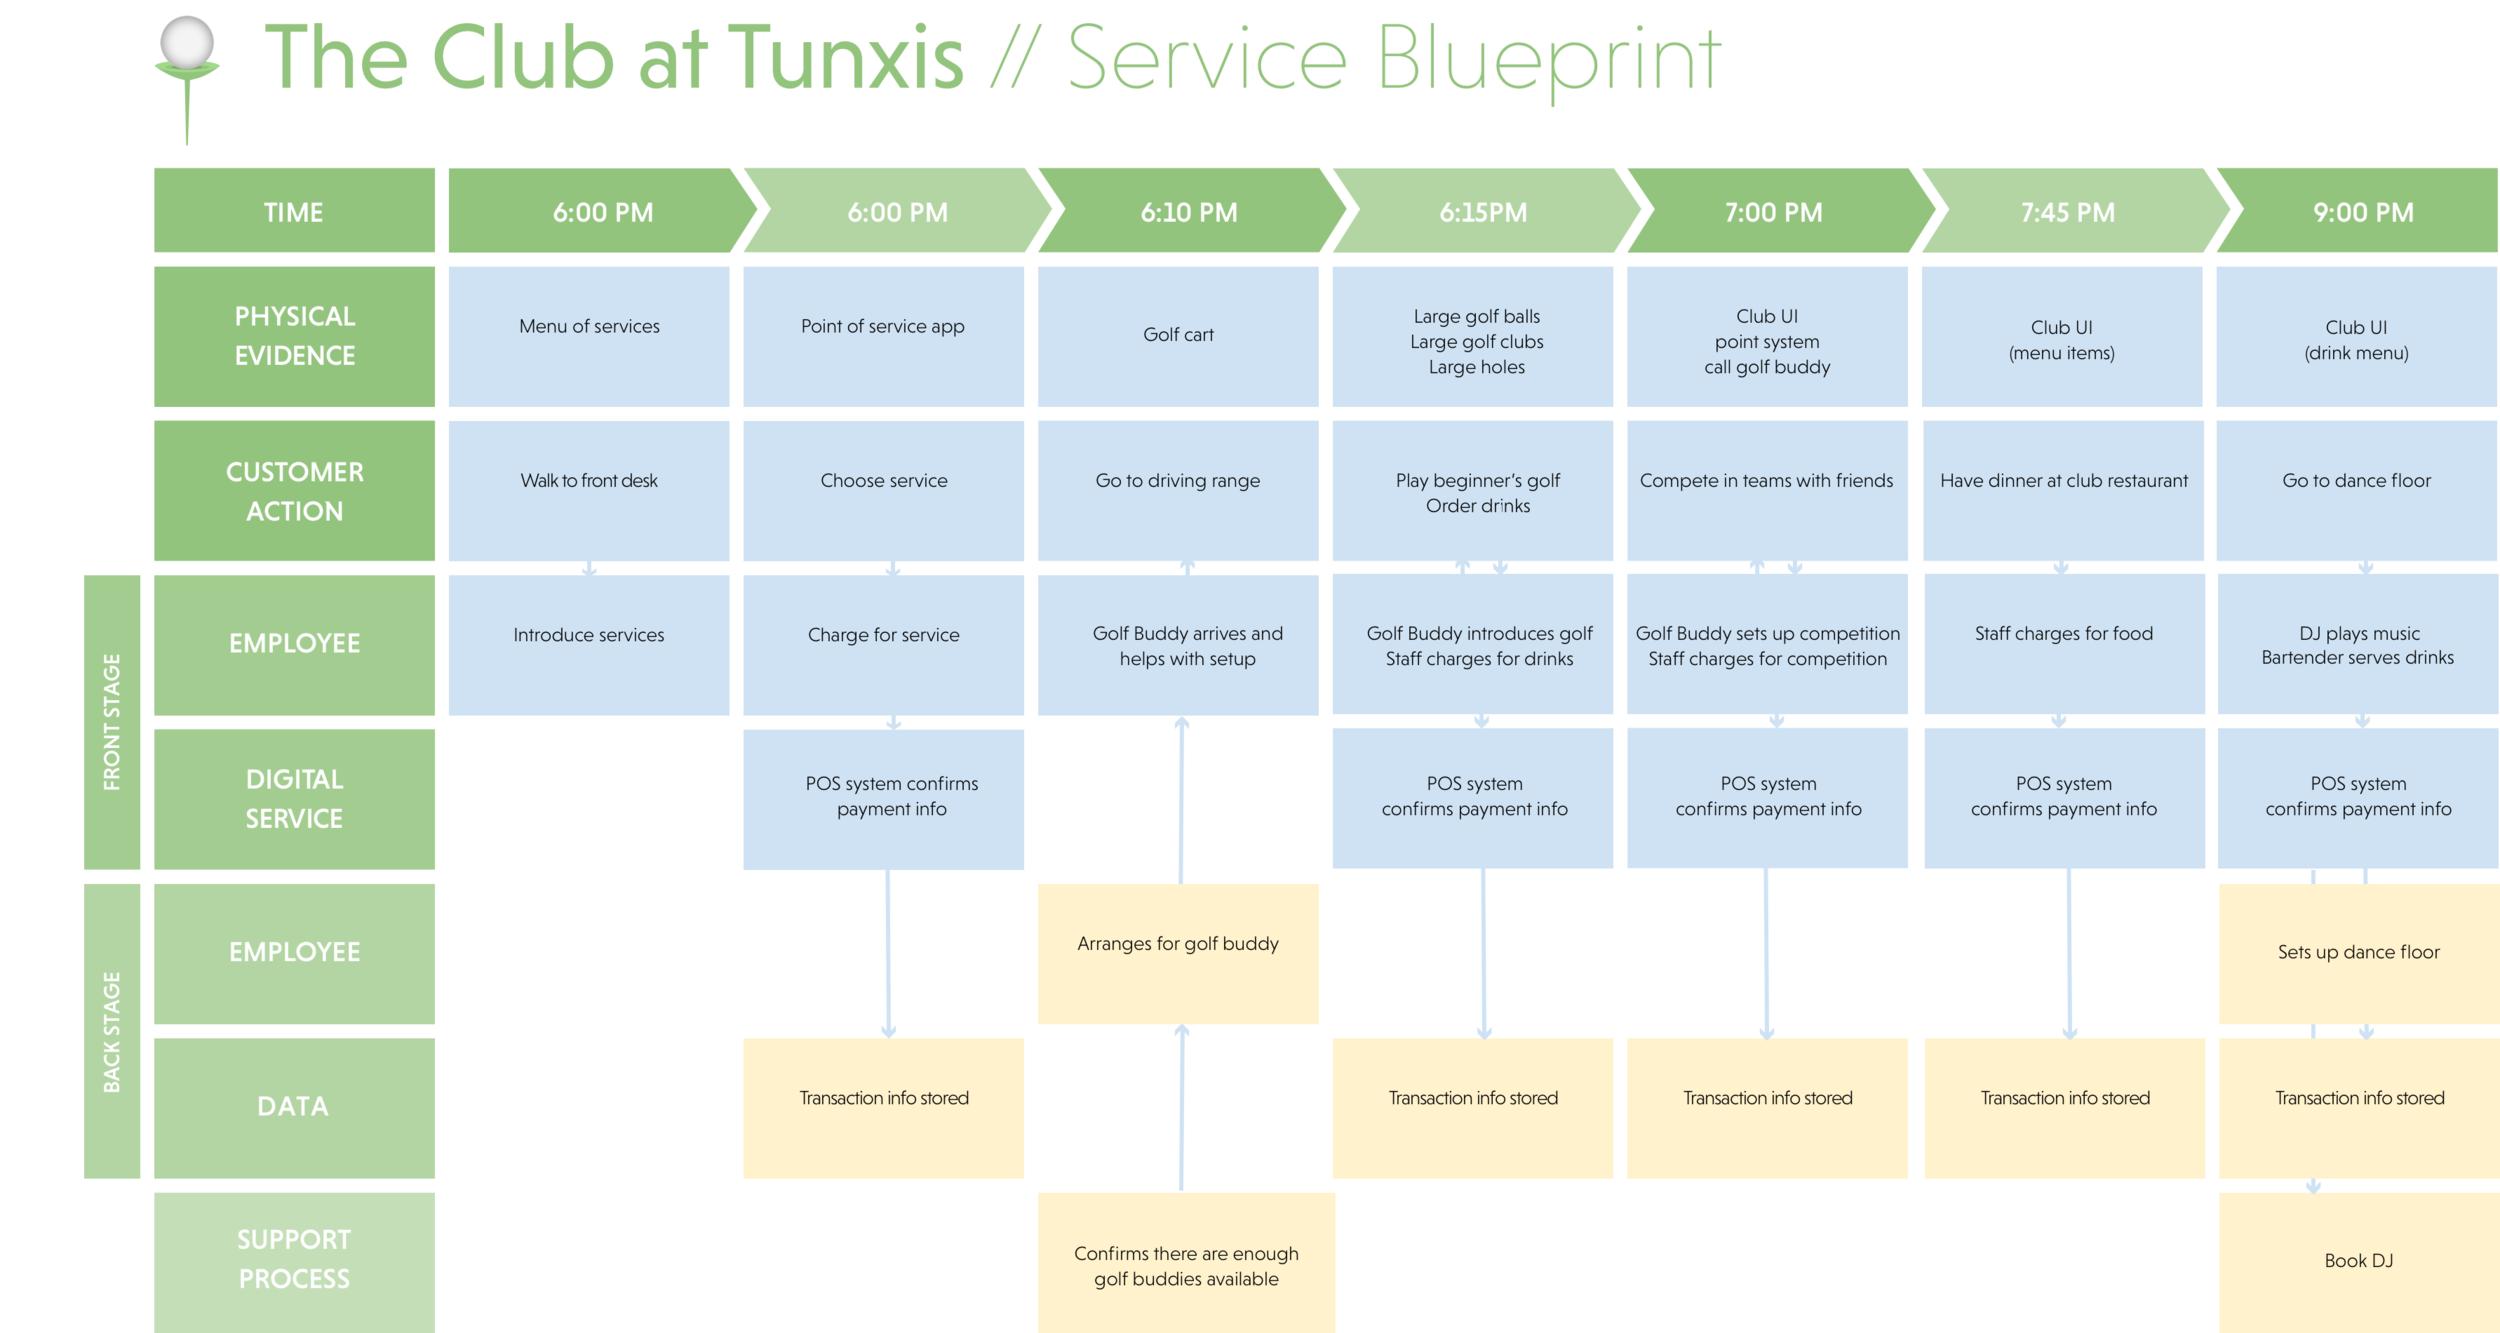 A service blueprint for our driving range service design.